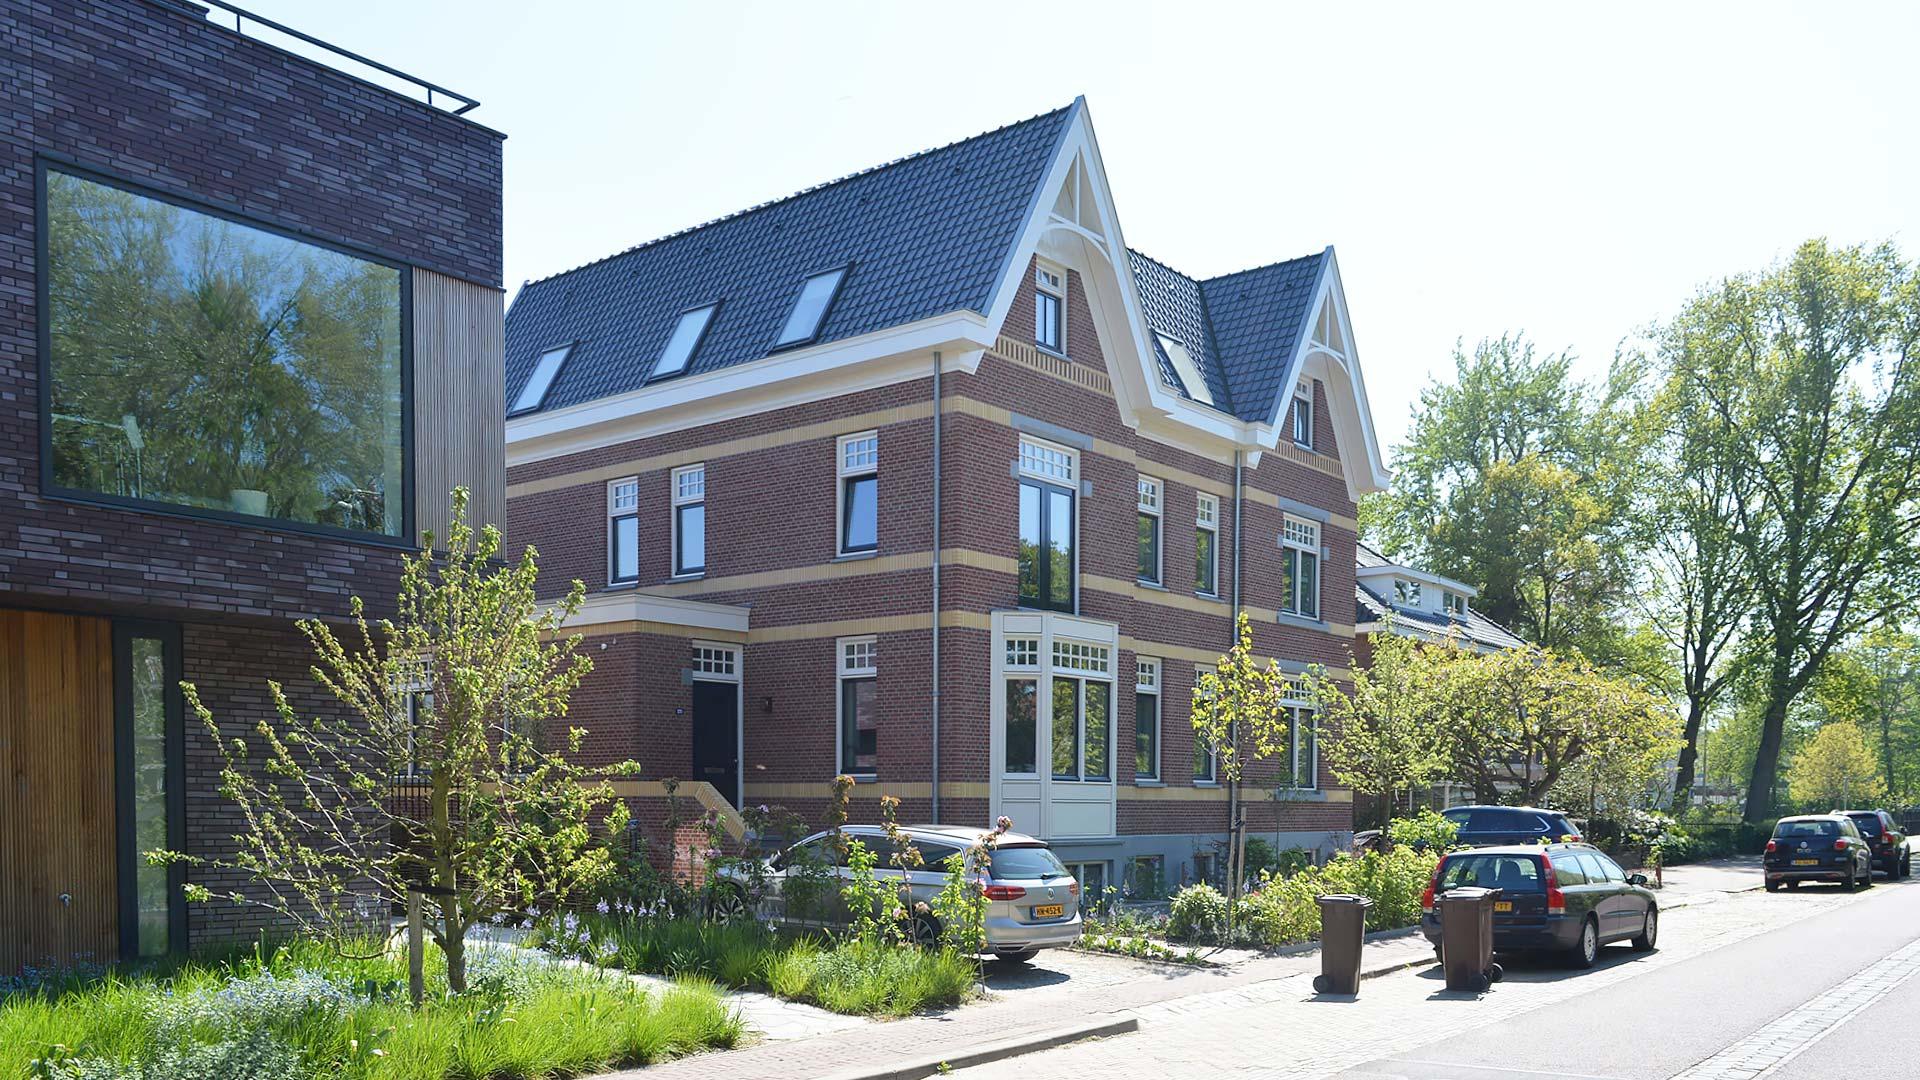 2-onder-1-kap woning Leidseweg Utrecht